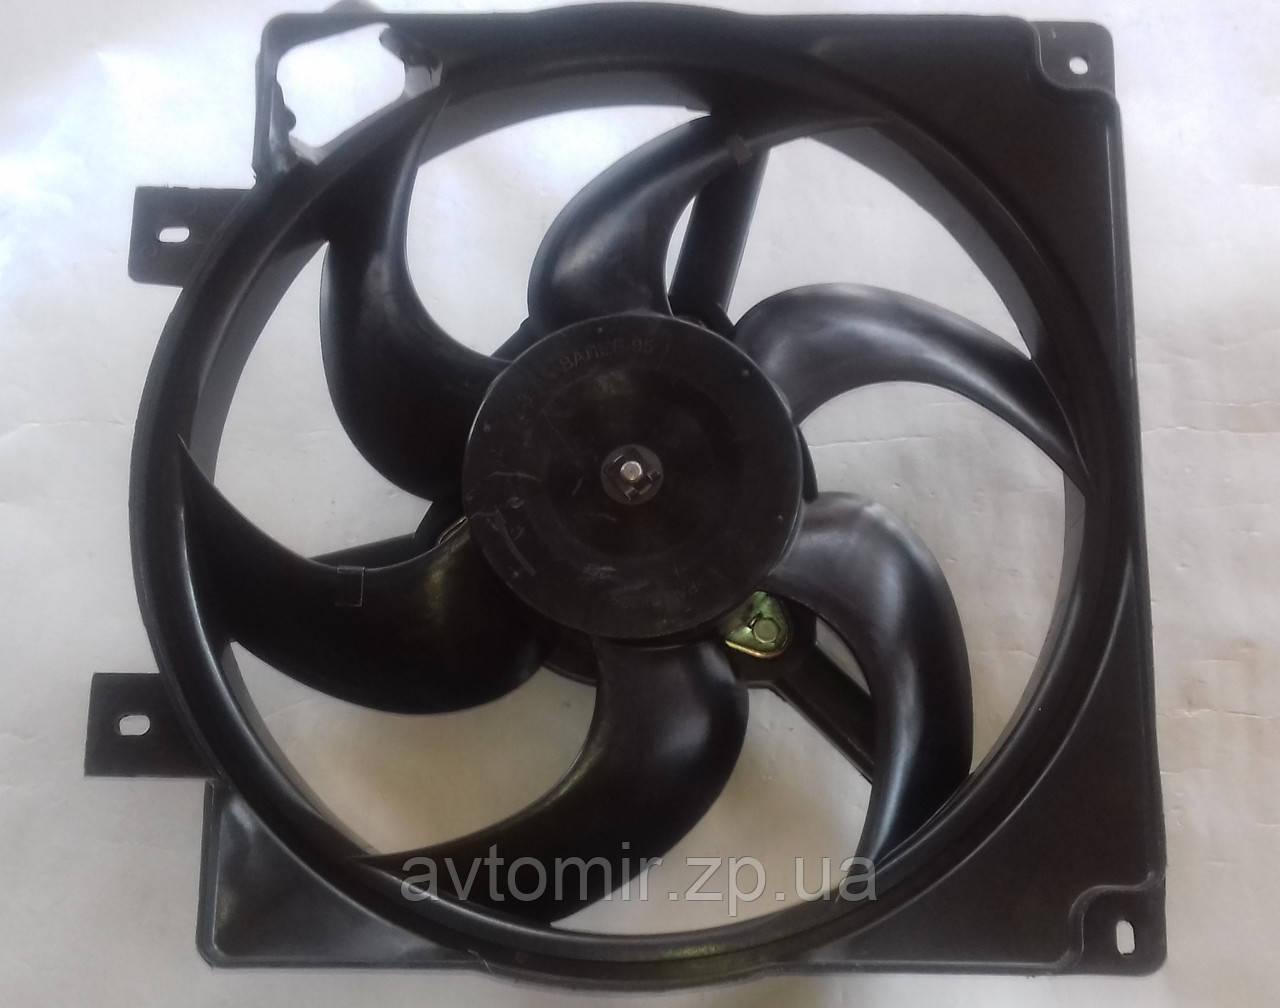 Диффузор радиатора Ваз 1118 в сборе пластик без кондиционера